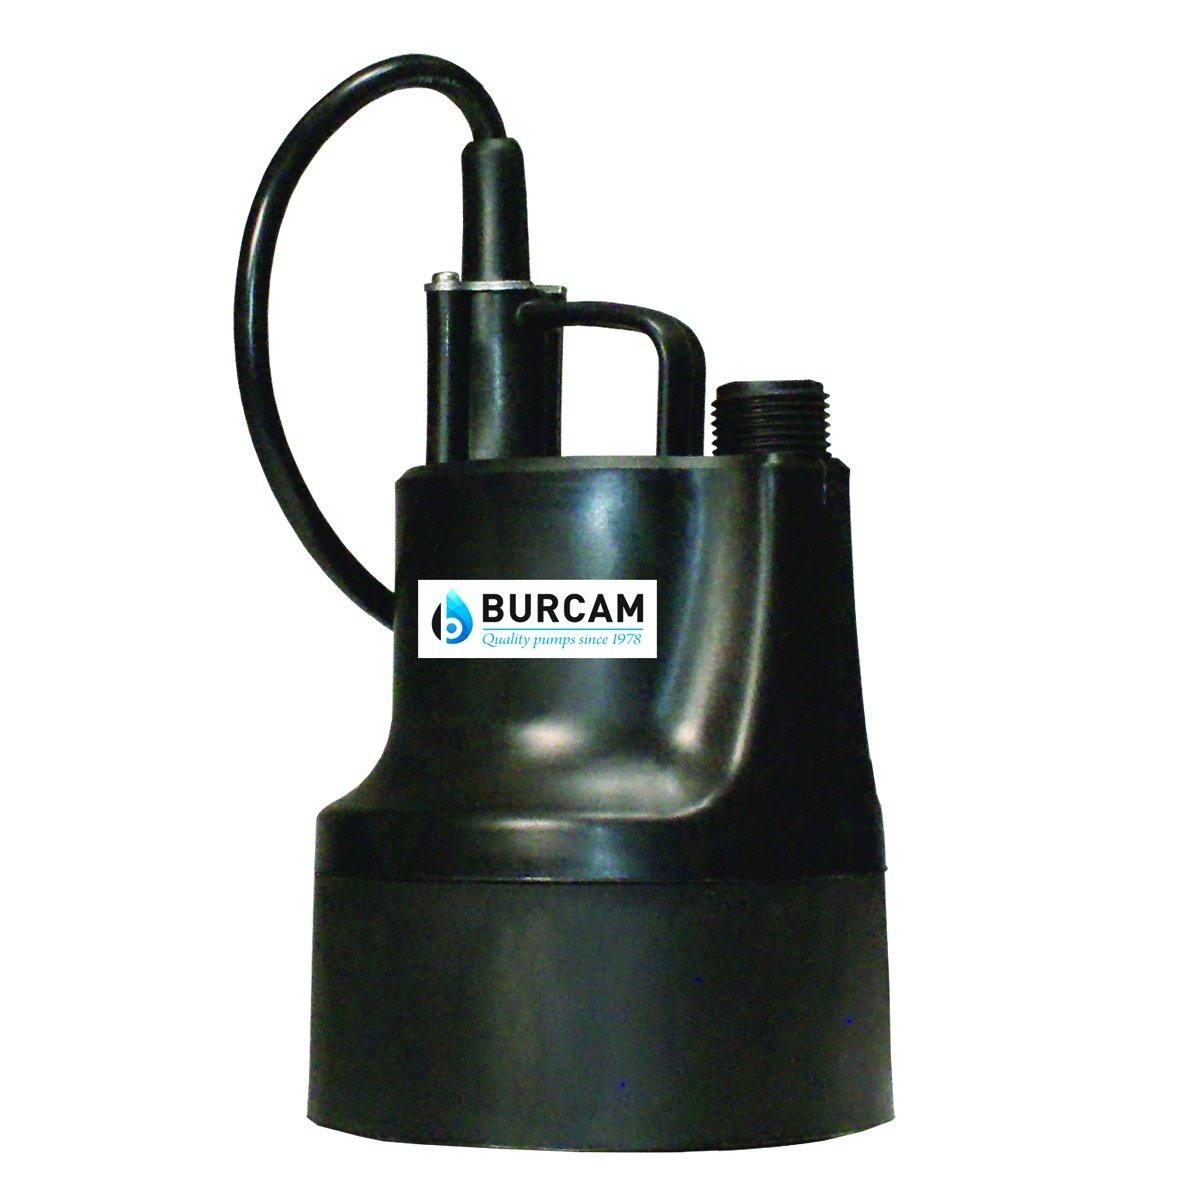 BURCAM 300506BPS 1/6 HP Submersible Utility Pump